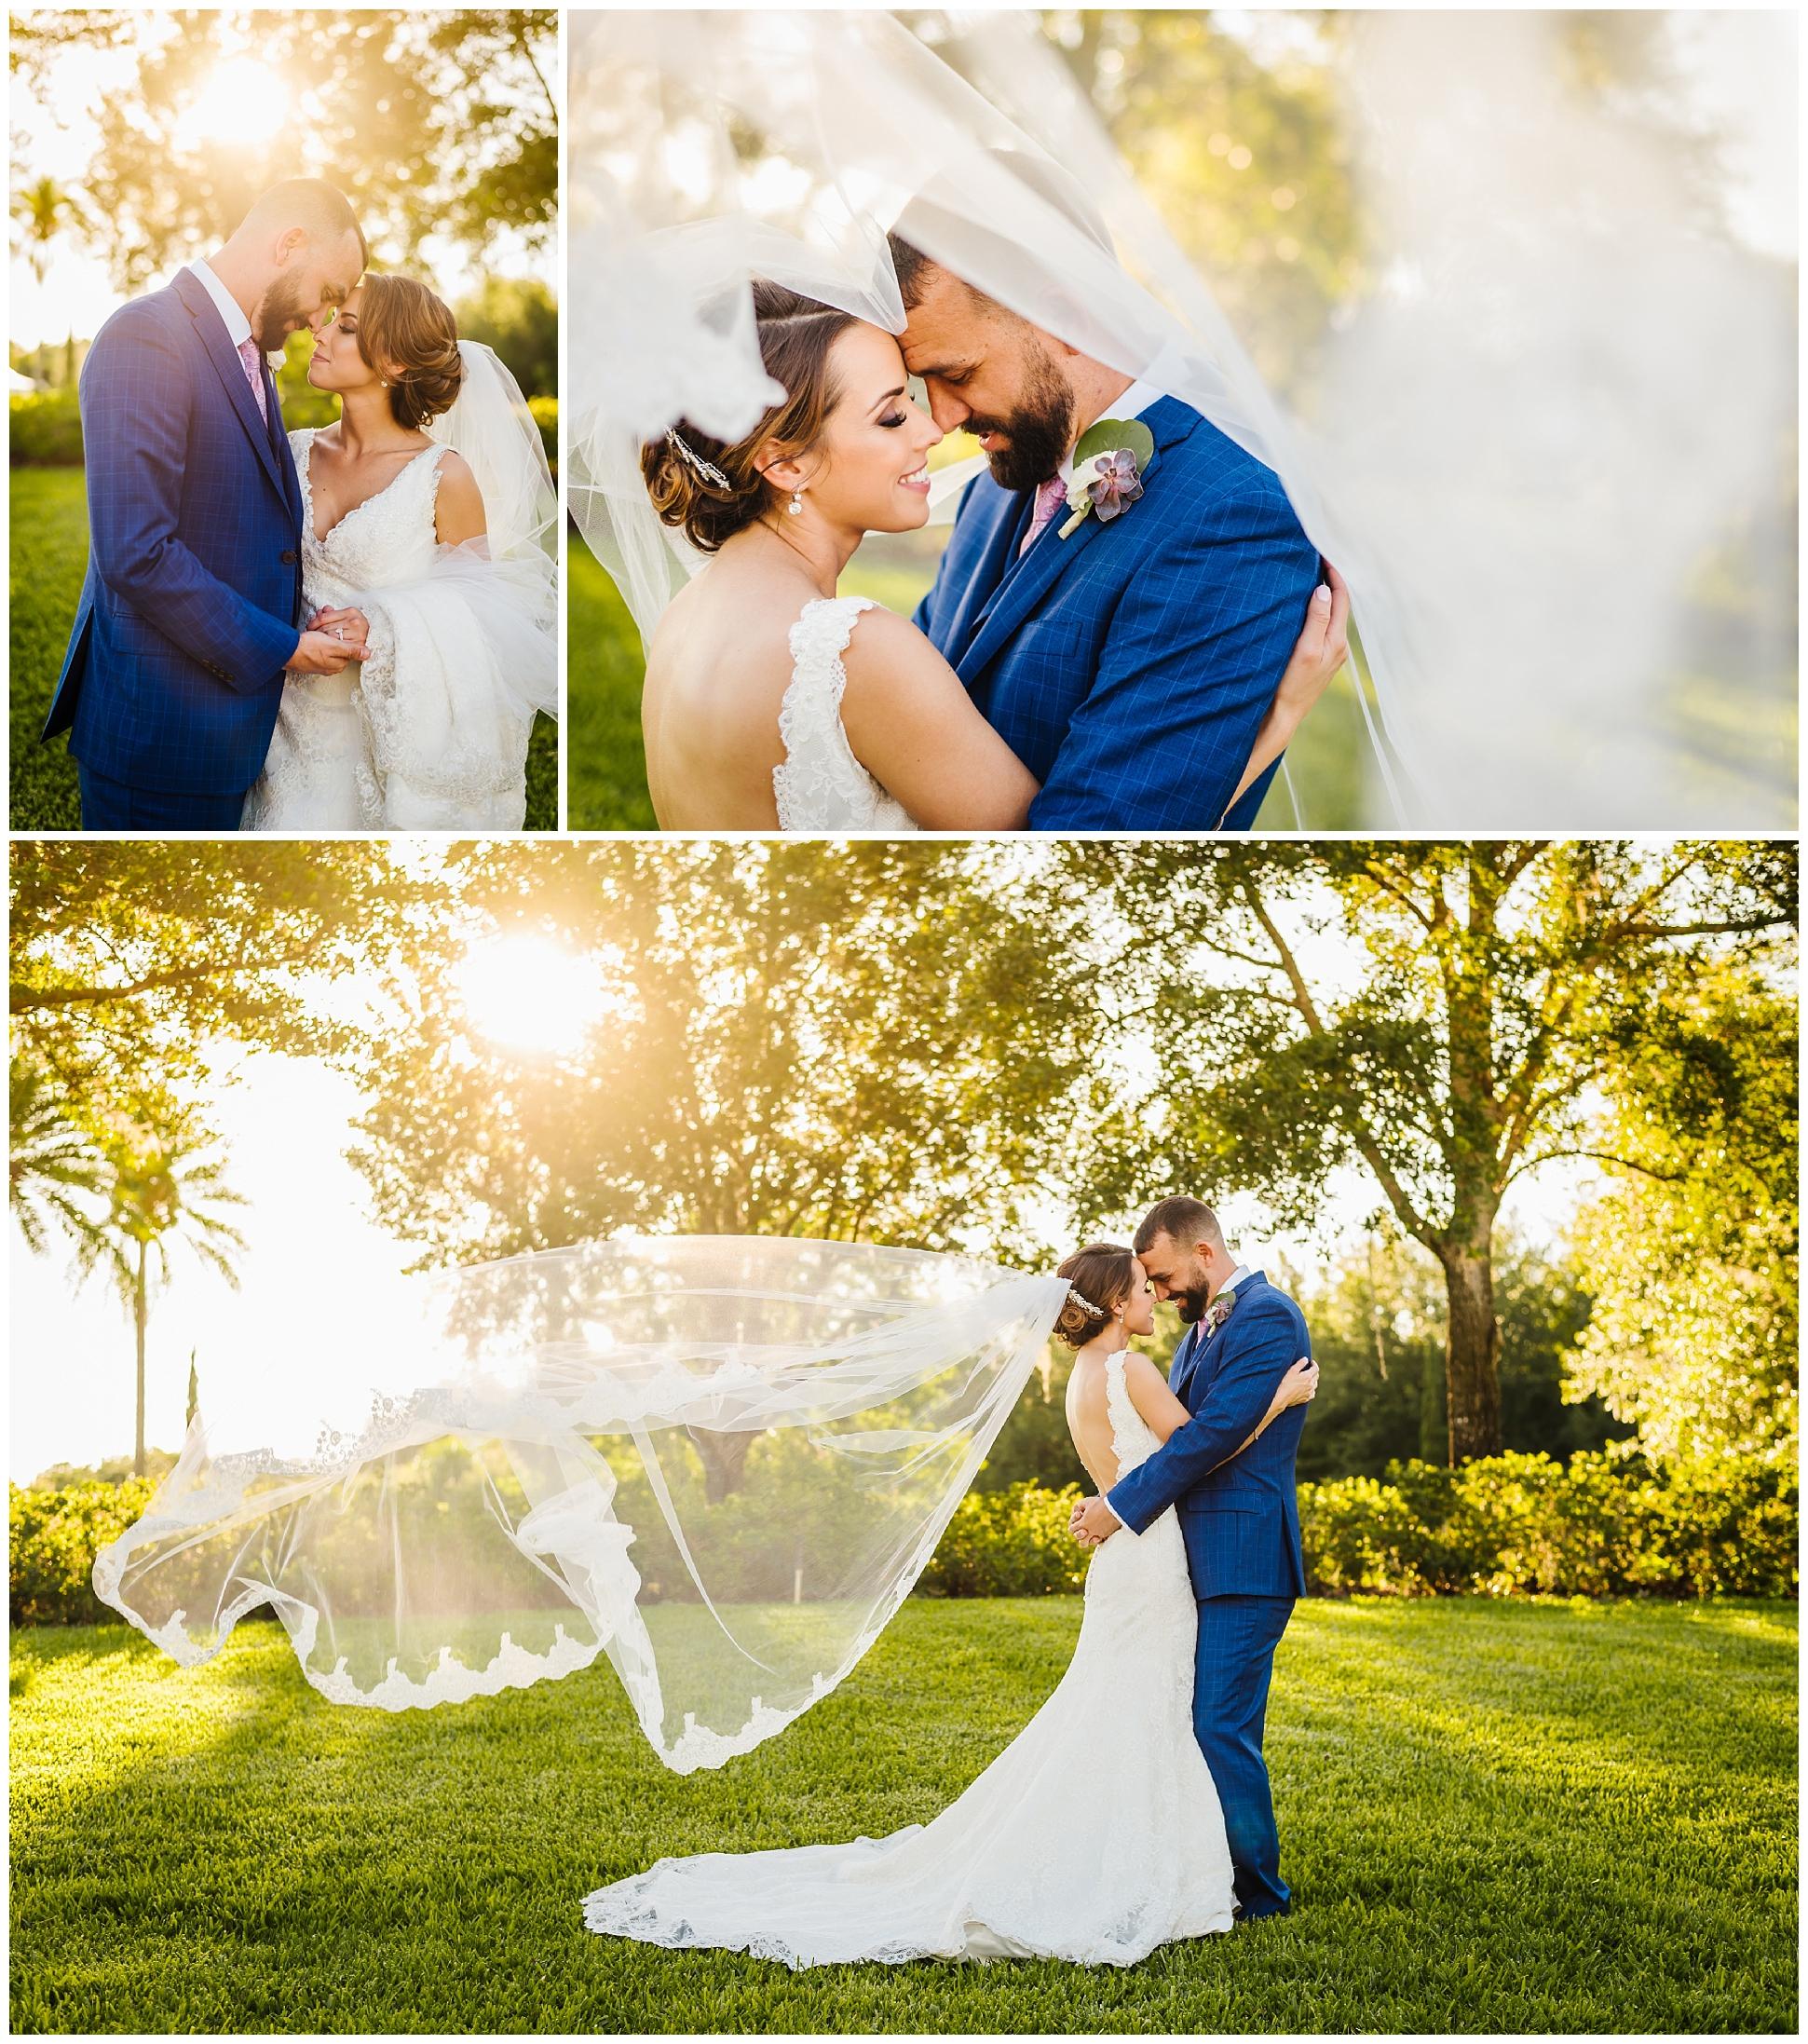 Tampa-luxury-wedding-photographer-mision-lago-private-estate_0043.jpg